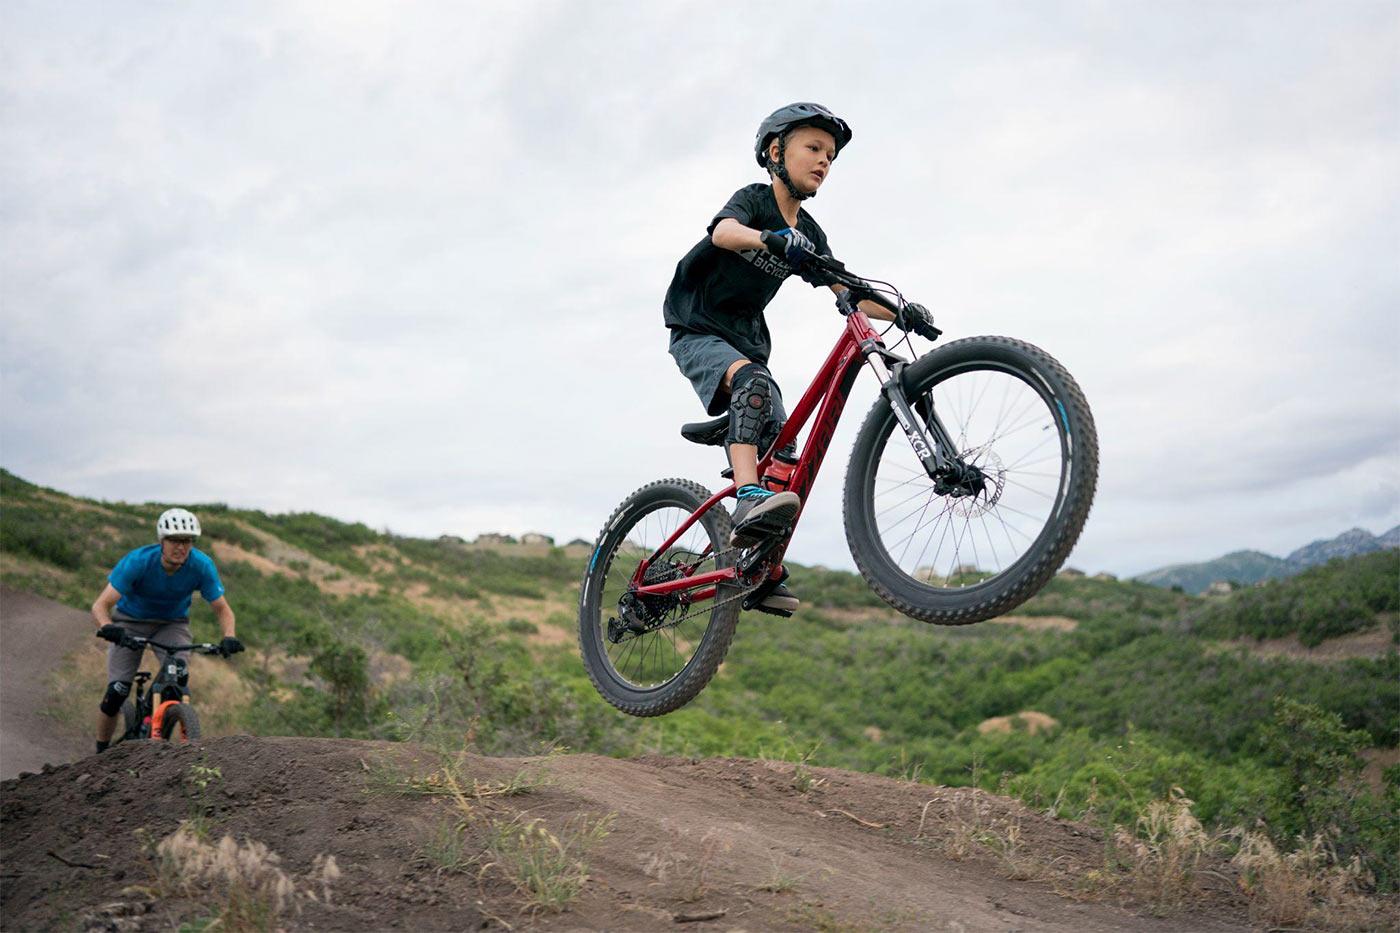 boy jumping a ramp on fezzari lone peak kids mountain bike